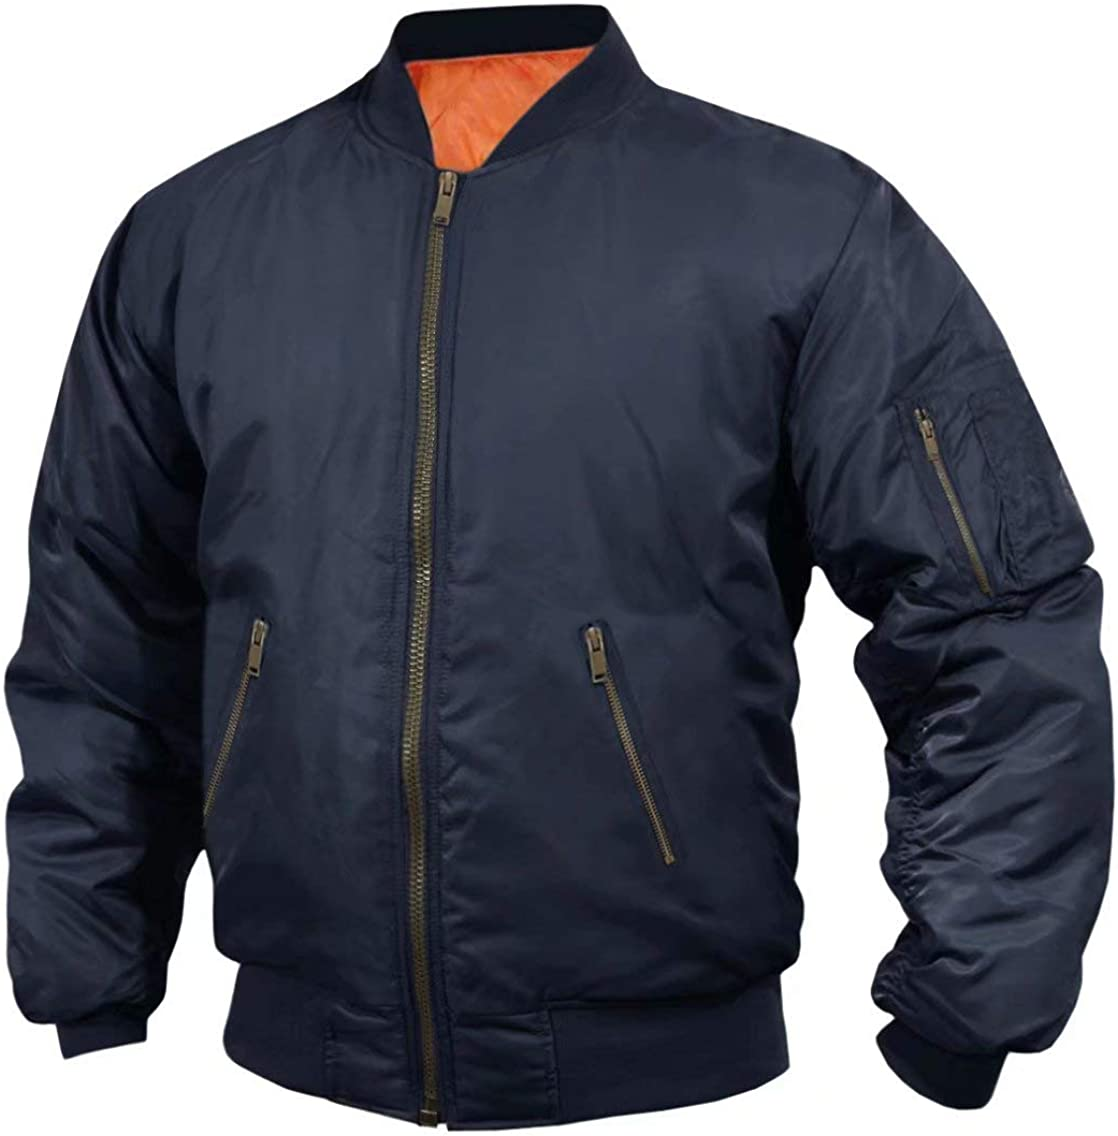 Ski Jacket Men Thick Lightweight Bomber Jacket Pilot College Jogging Windbreaker Softshell Outwear Navy at  Men's Clothing store